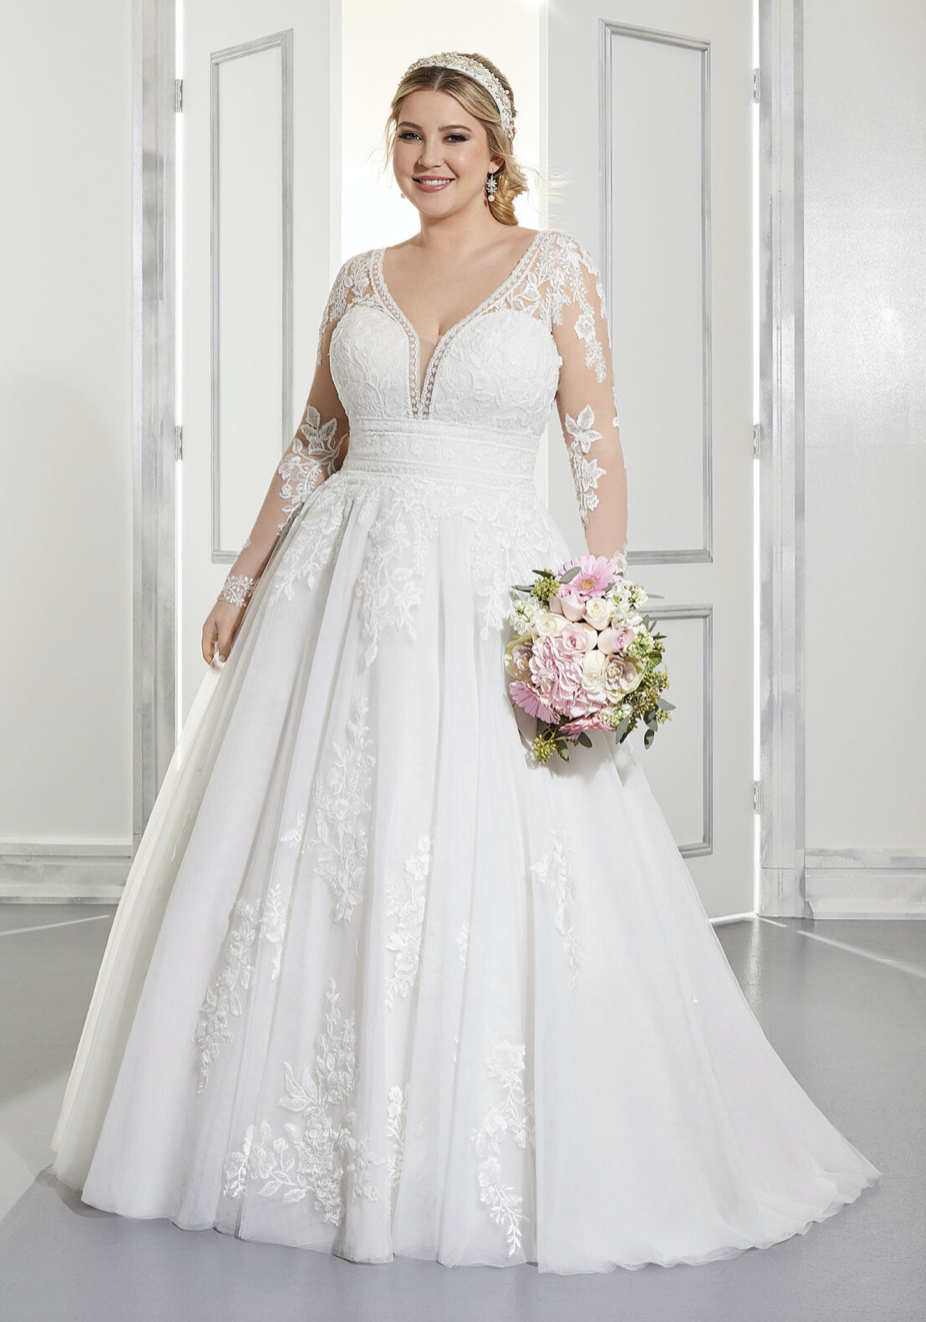 Ama Wedding Dress 3304